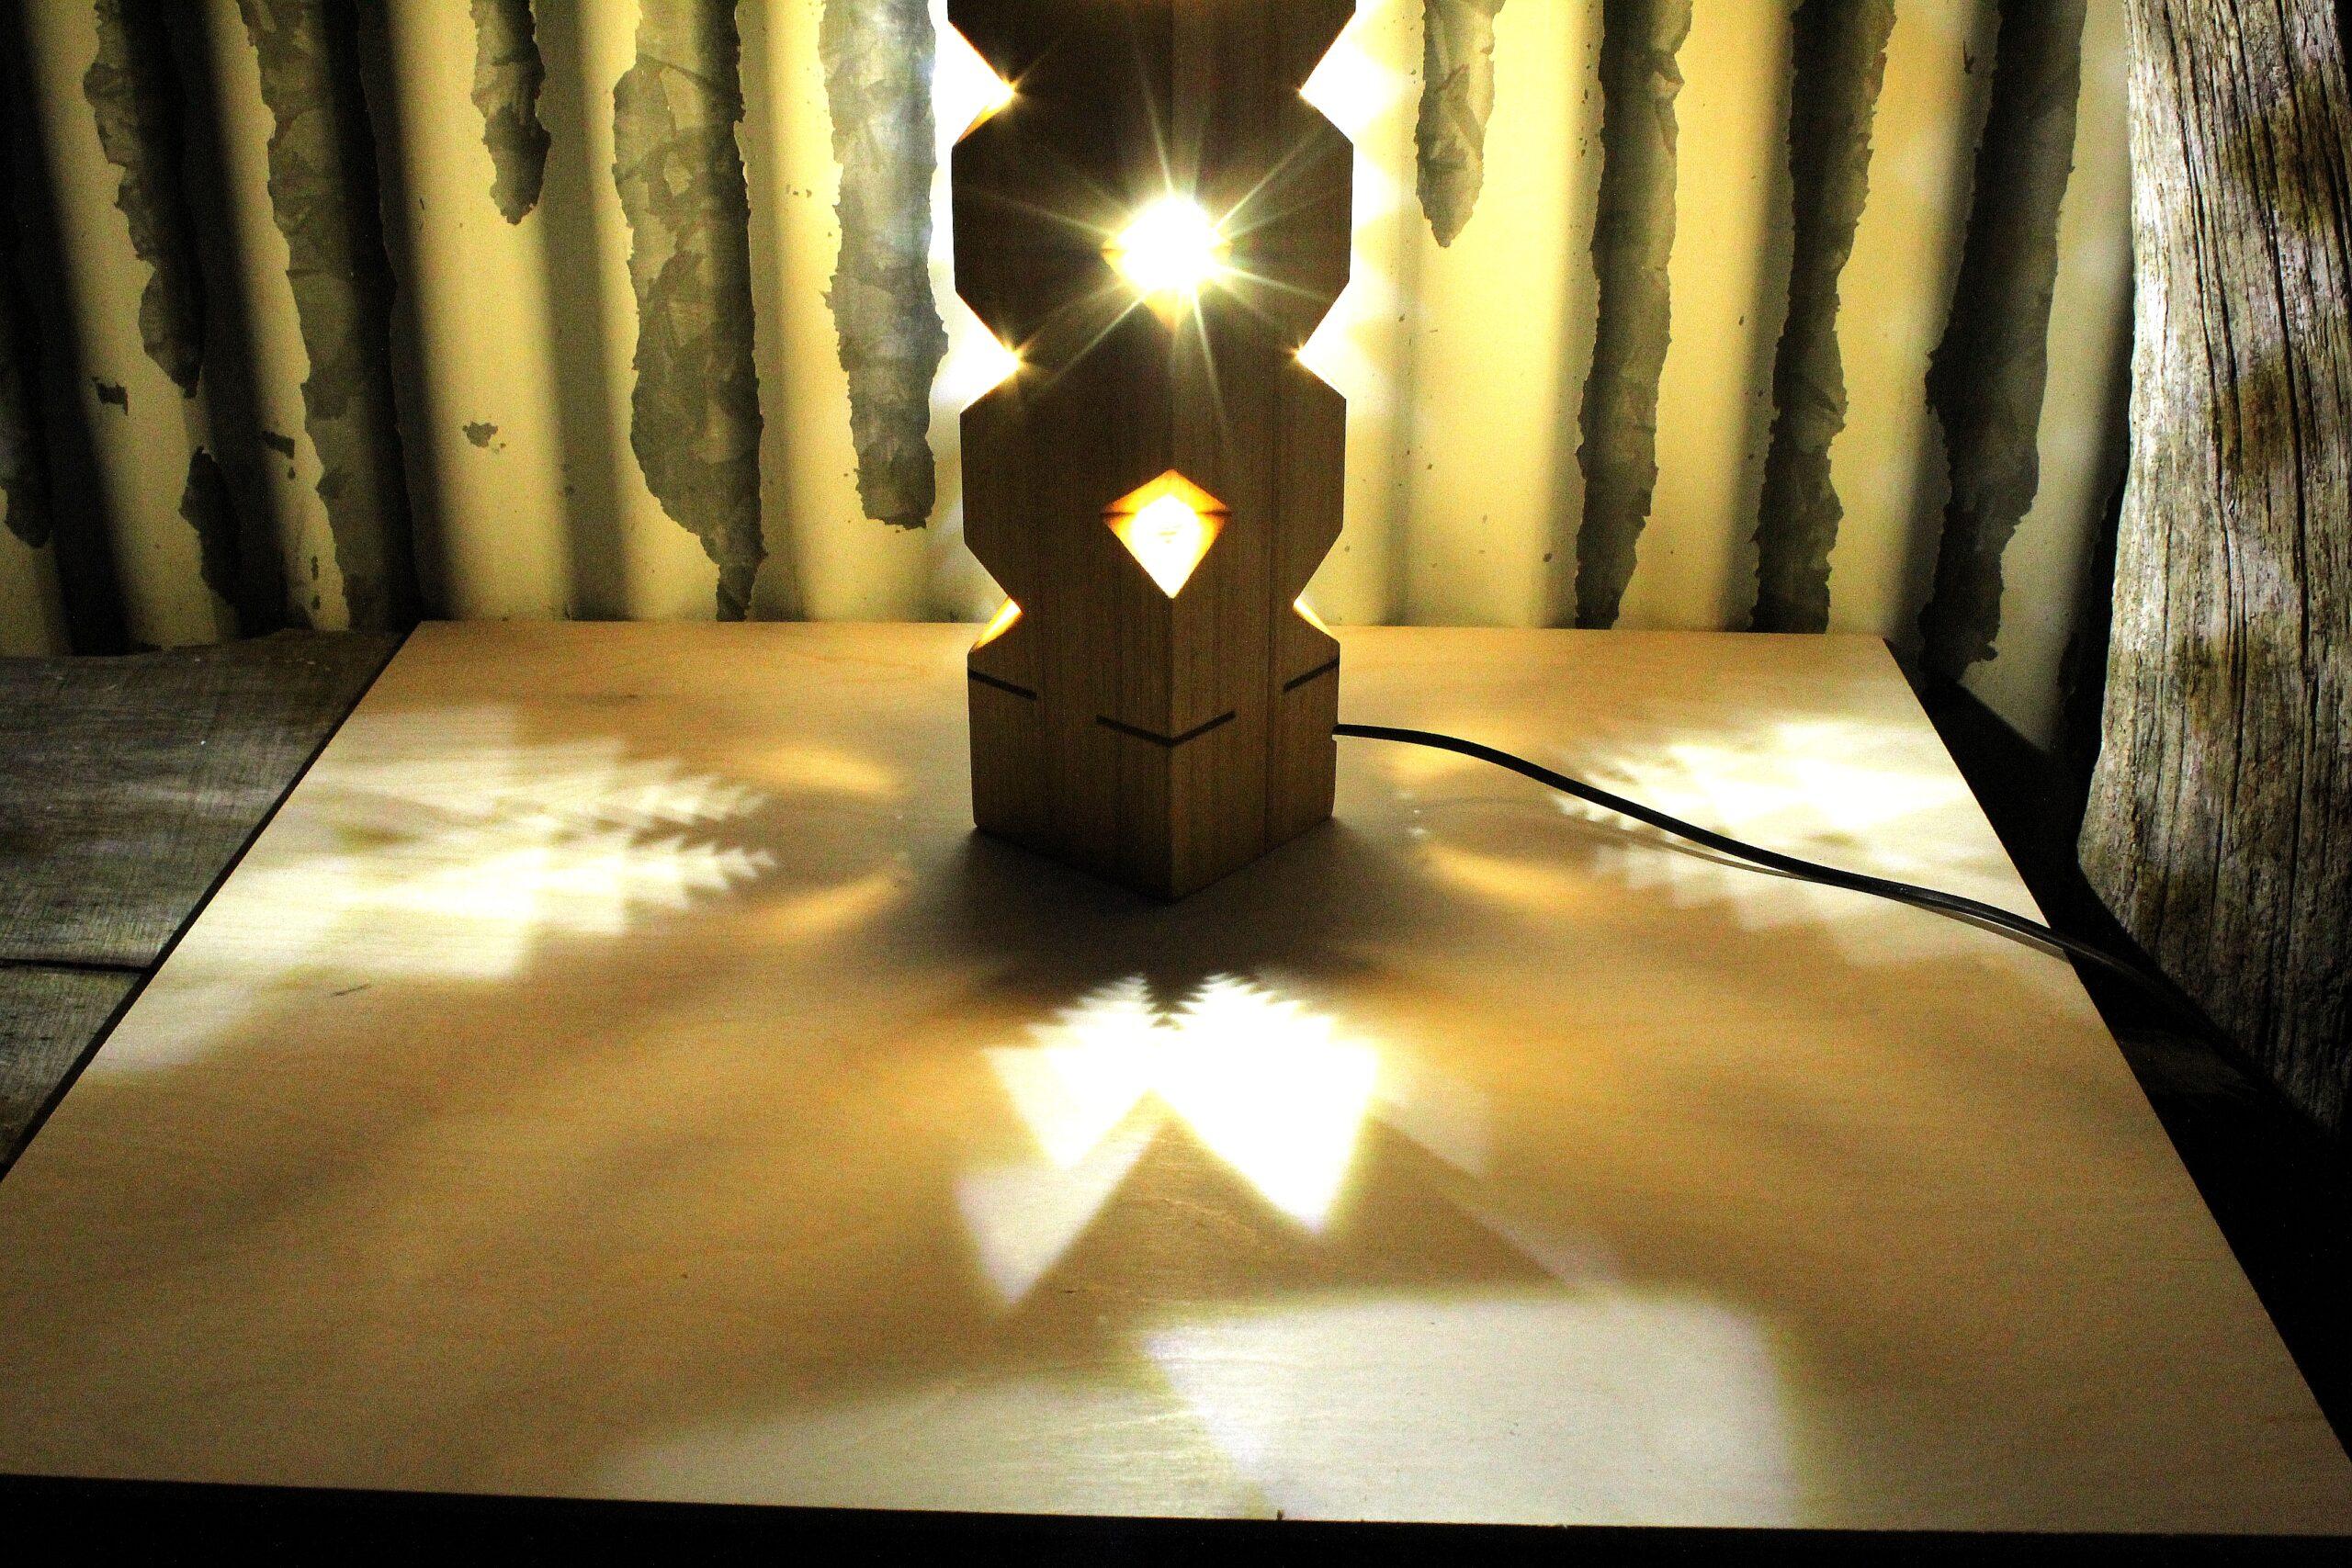 Lampade cactus - lampade di legno